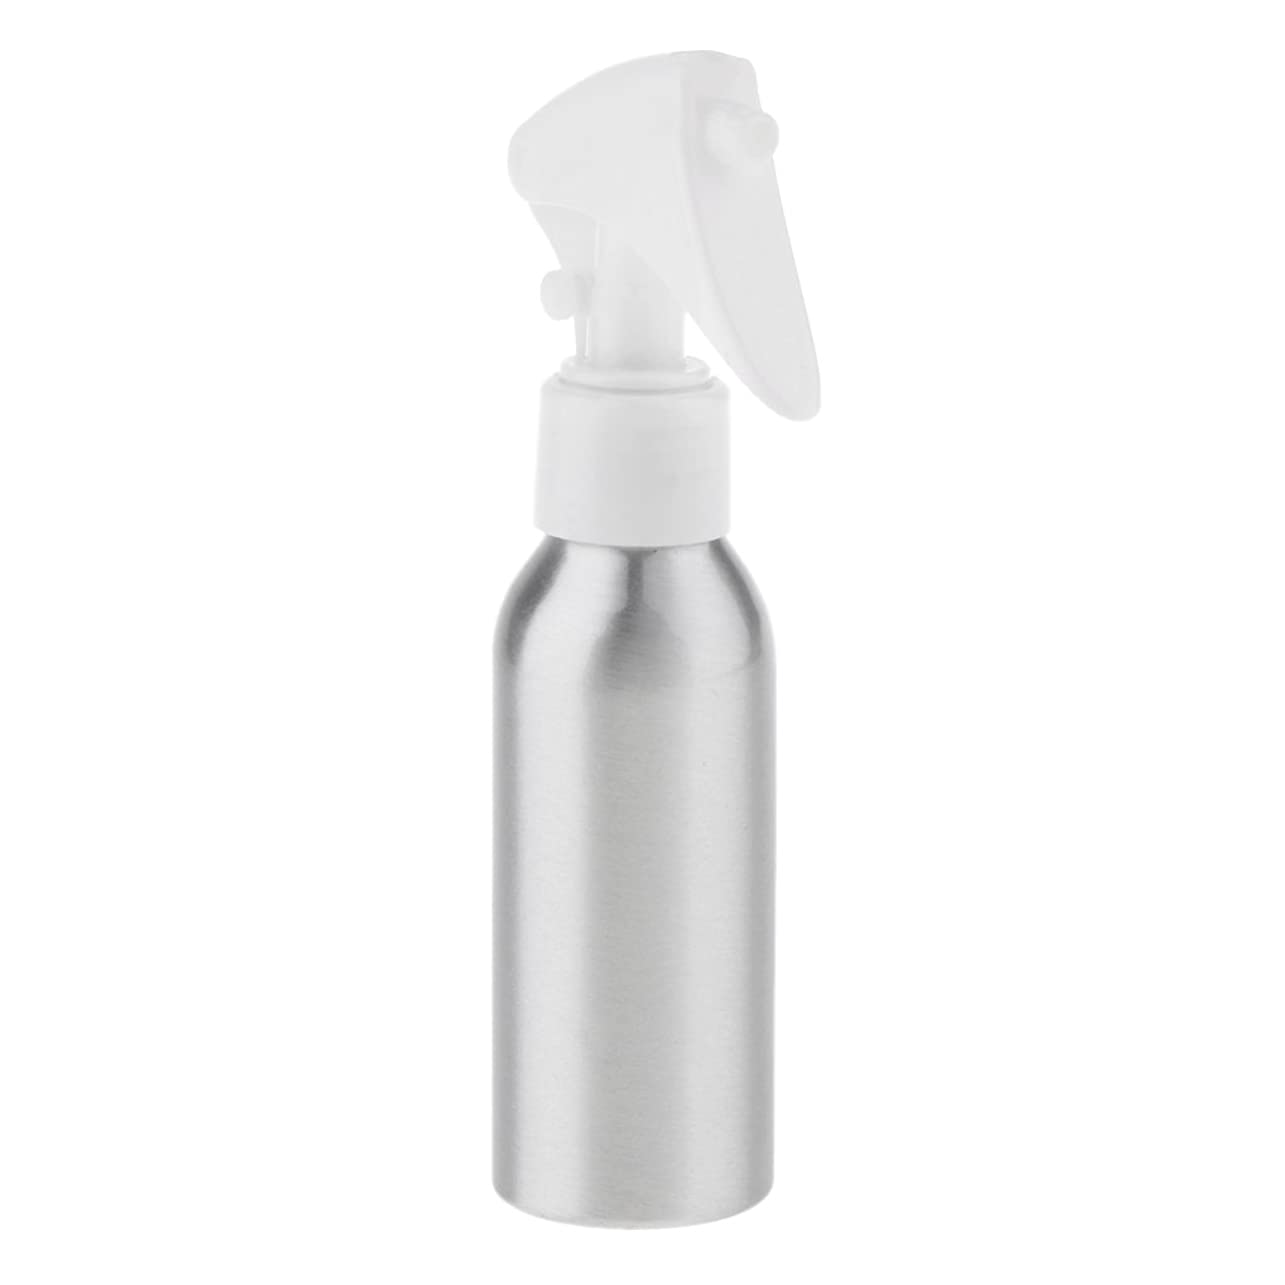 CUTICATE スプレーボトル 空ボトル 水スプレー スプレー ポンプボトル 噴霧器 プロのサロン 多機能 6サイズ選択 - 120ML